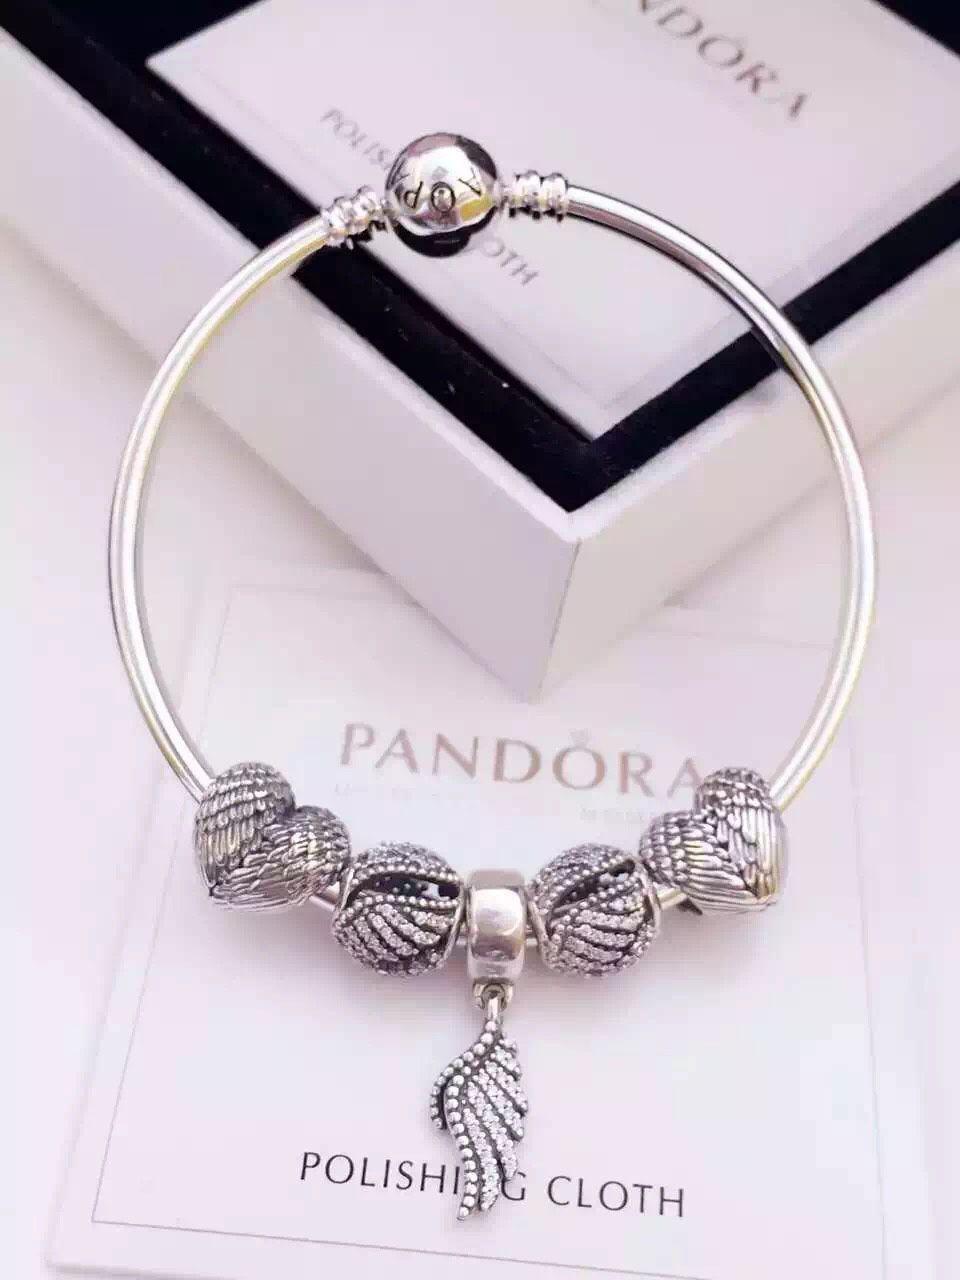 159 Pandora Bangle Charm Bracelet Silver Hot